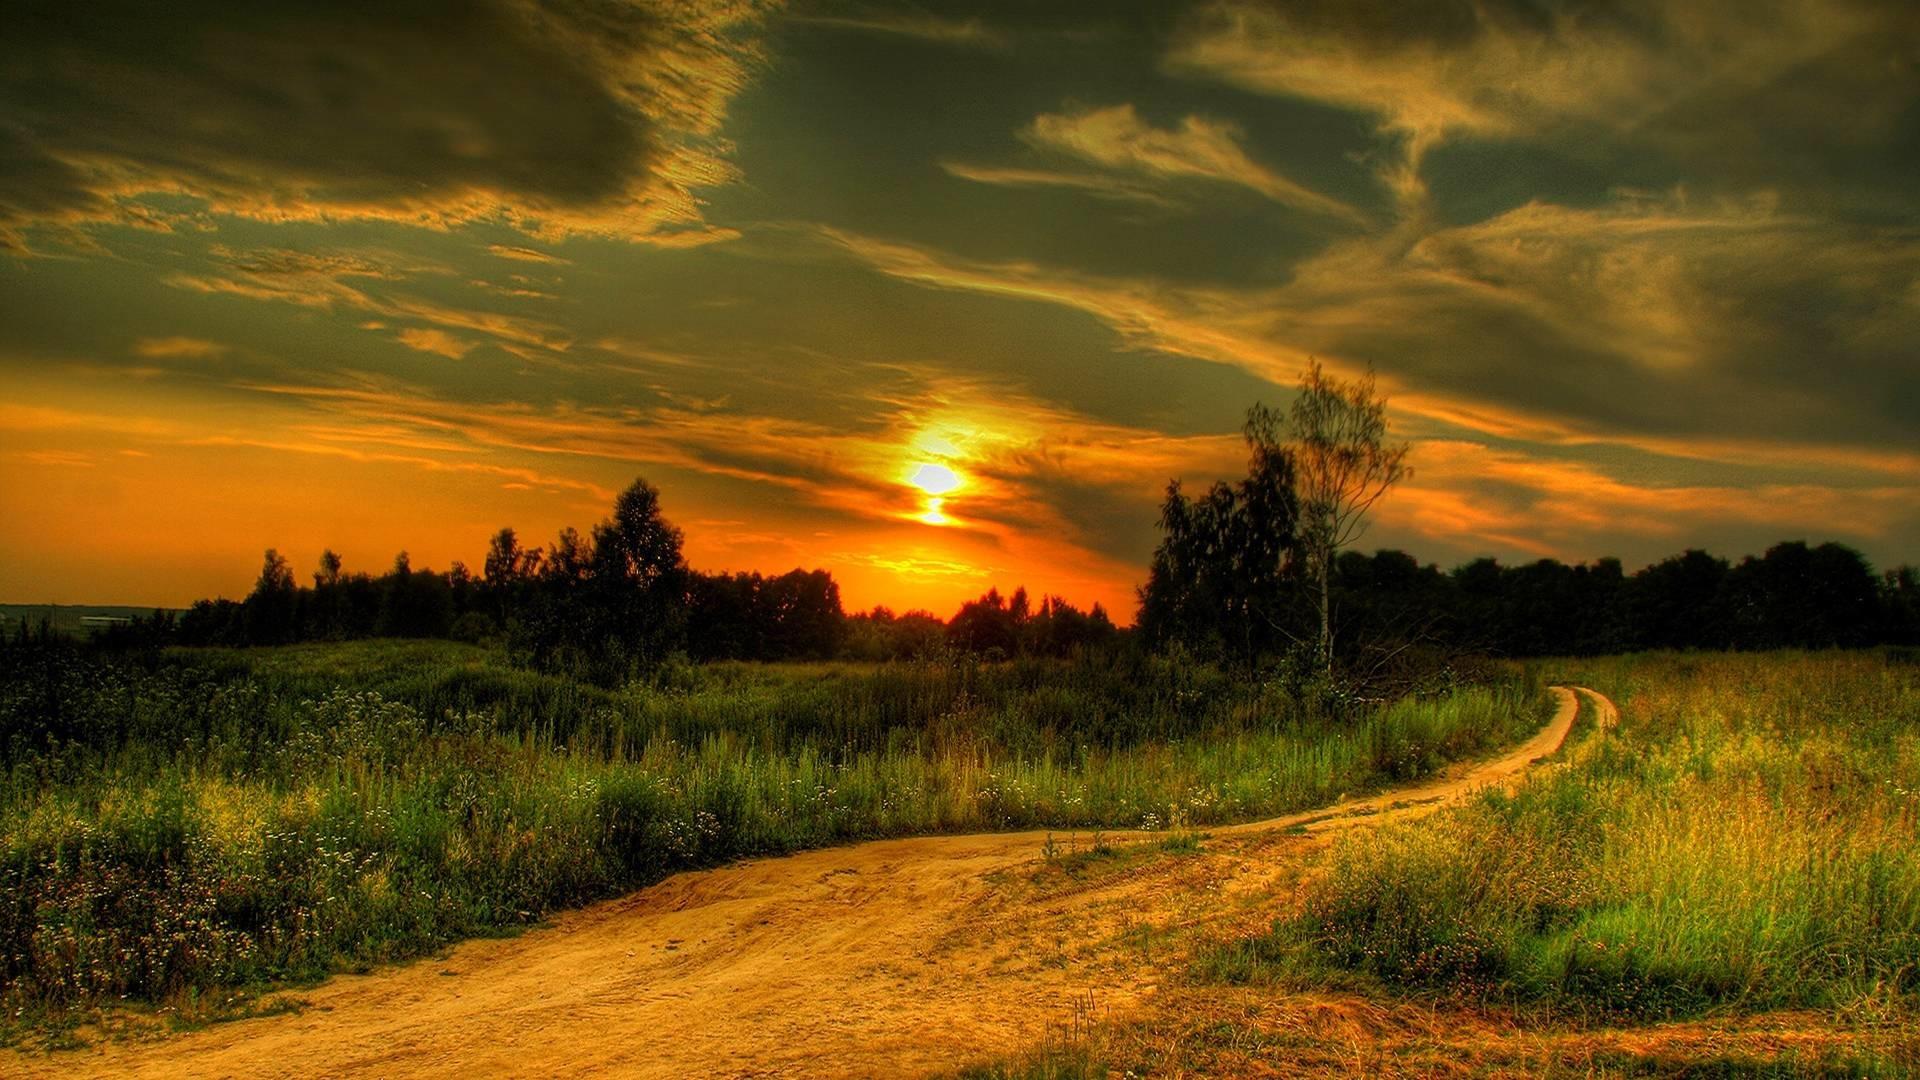 Beautiful Scenery Wallpaper Wallpapers – HD Wallpapers 91975